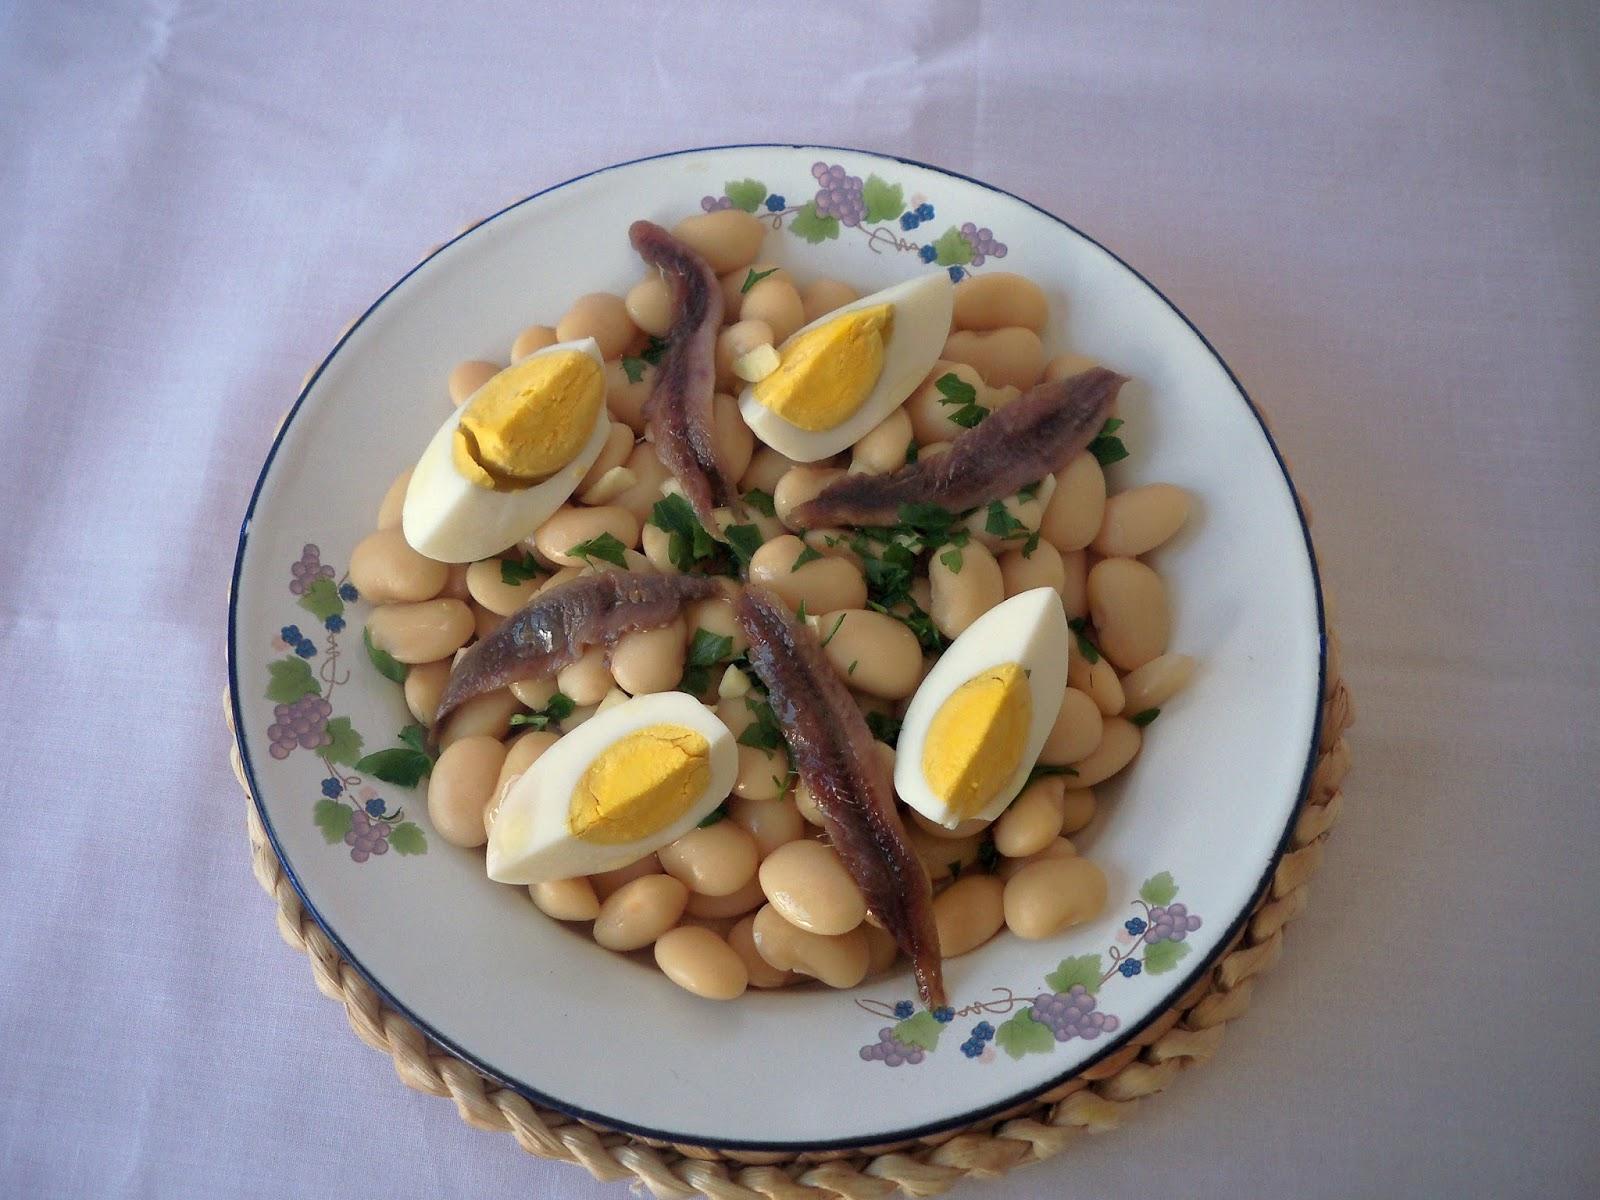 Aurea s kitchen salado ensalada de alubias - Ensalada de alubias ...